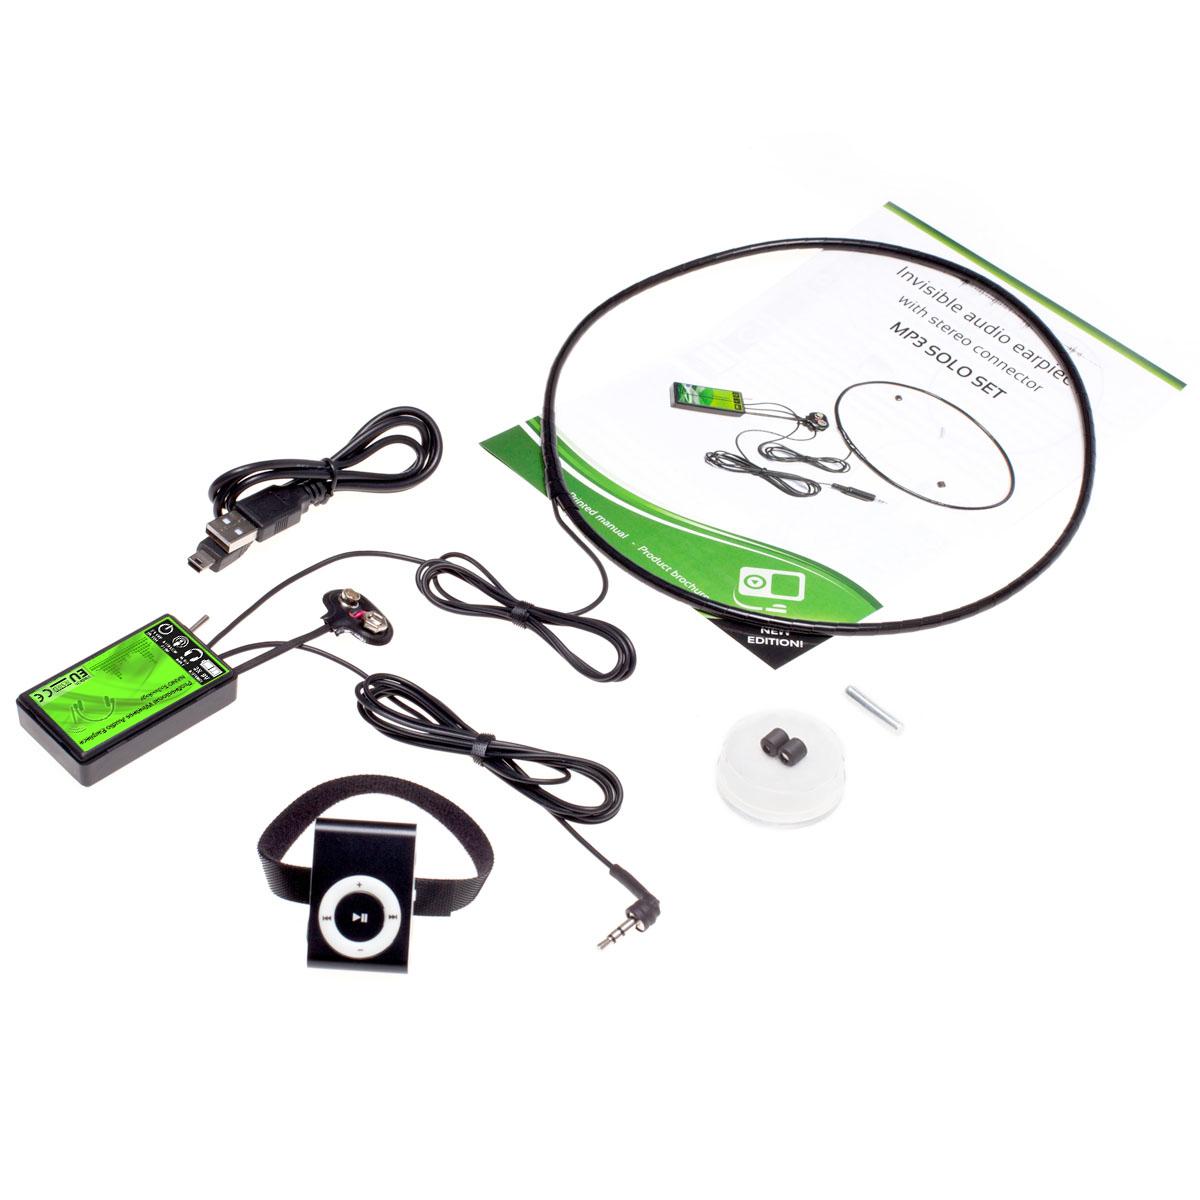 262346294726 additionally Neural Dust Implant Sensor Brain Nerves Humans Machines Prosthetics Berkeley A7170251 besides Inferidream blogspot furthermore Amazon Tap Echo Dot Price further Spy Gadgets. on smallest listening device